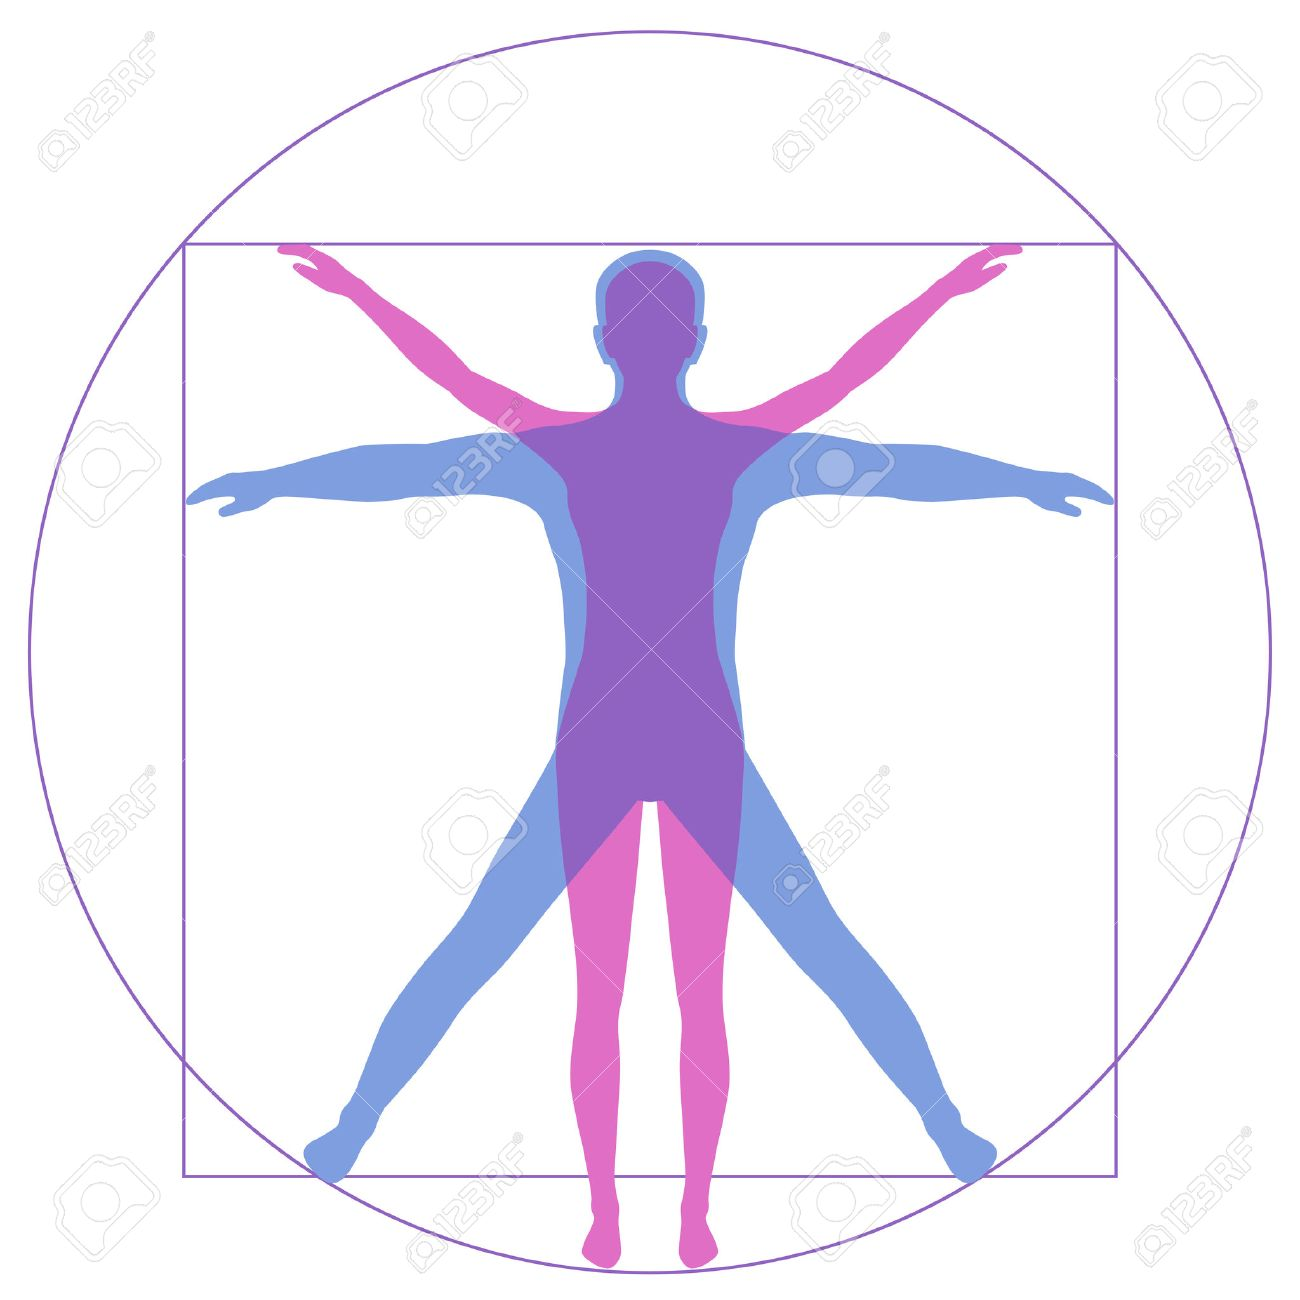 Leonardo Da Vinci Vetruvian Man, human anatomy - 54711988